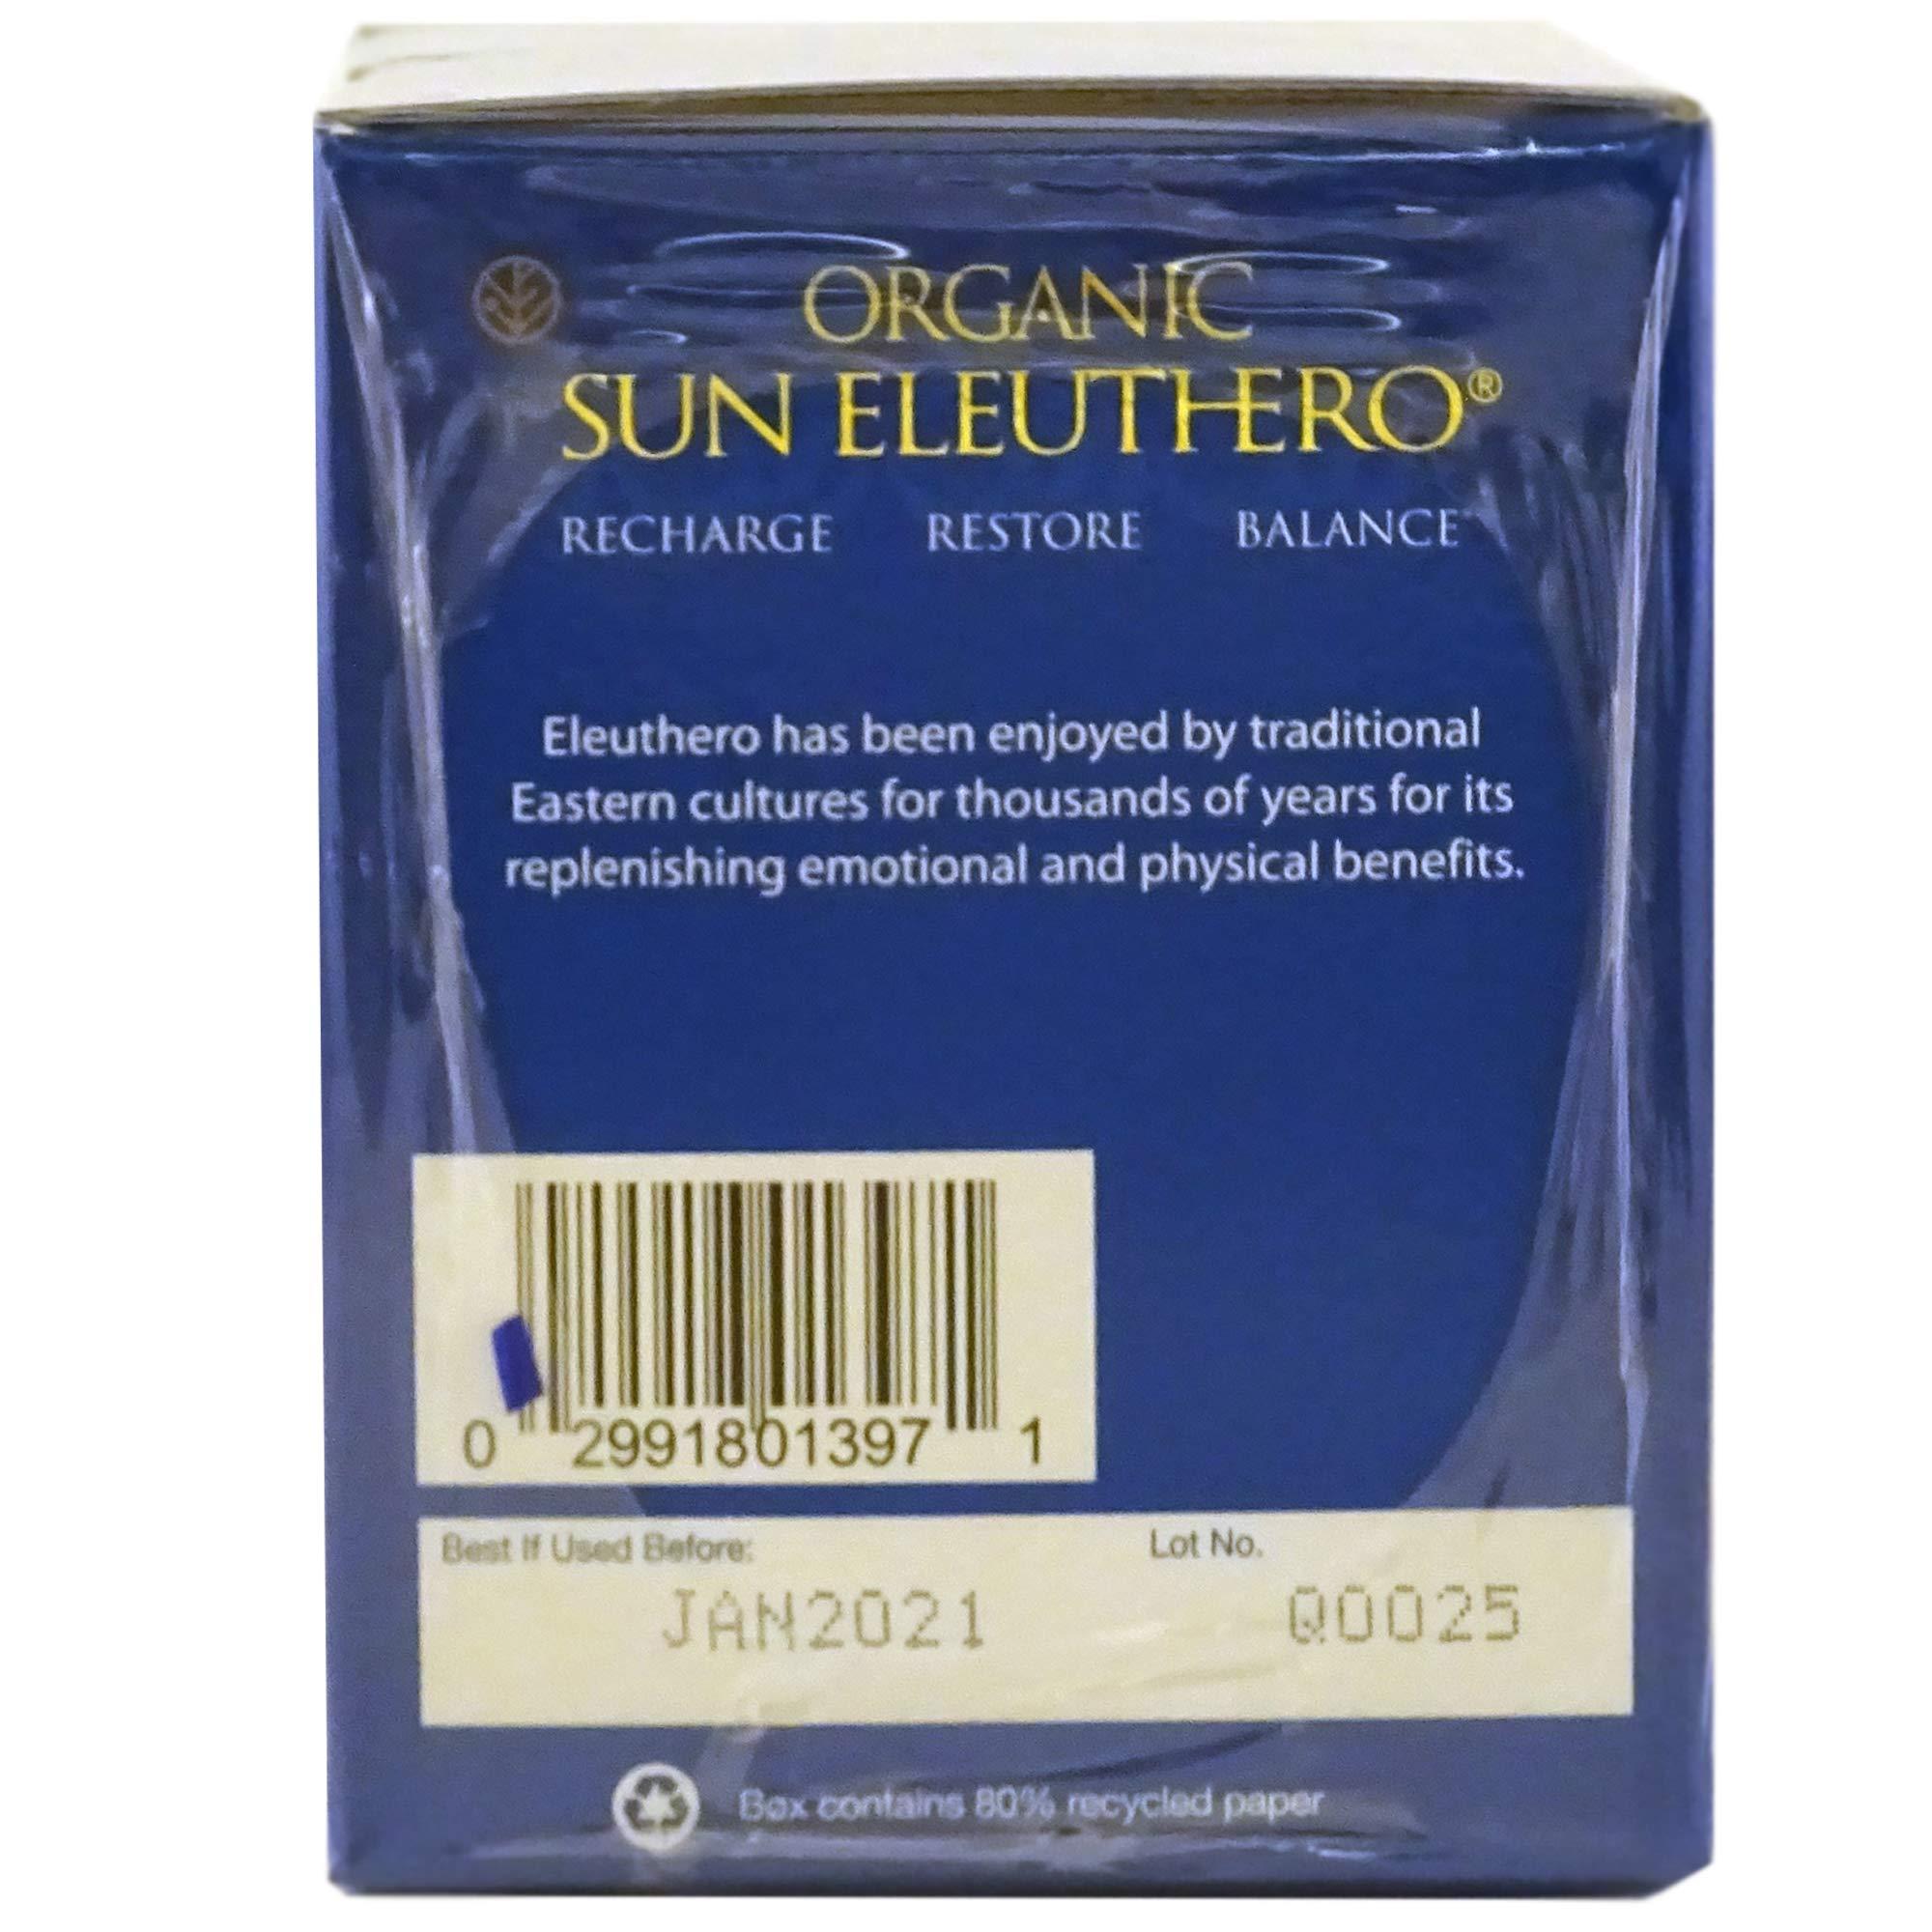 Sun Chlorella- Organic Sun Eleuthero Dietary Supplement- 200Mg Tablets (1200 Count) by Sun Chlorella (Image #3)